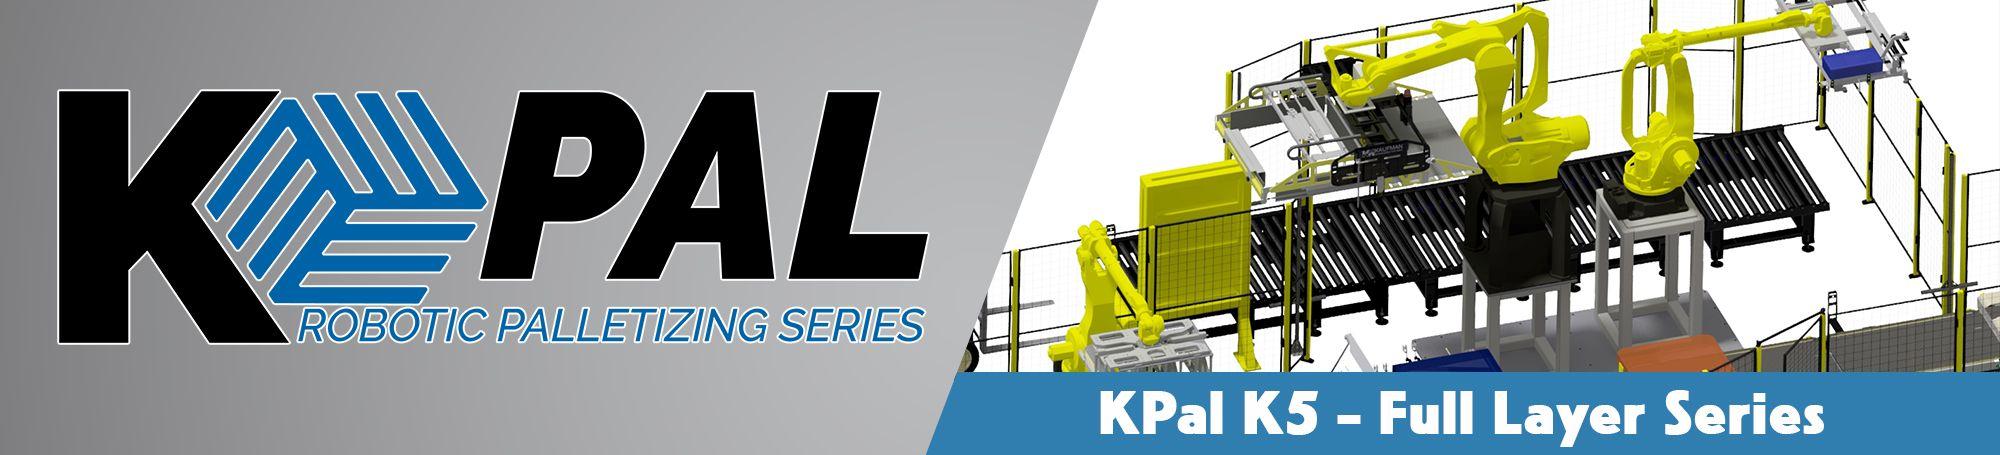 KPal Full Layer Group2.jpg